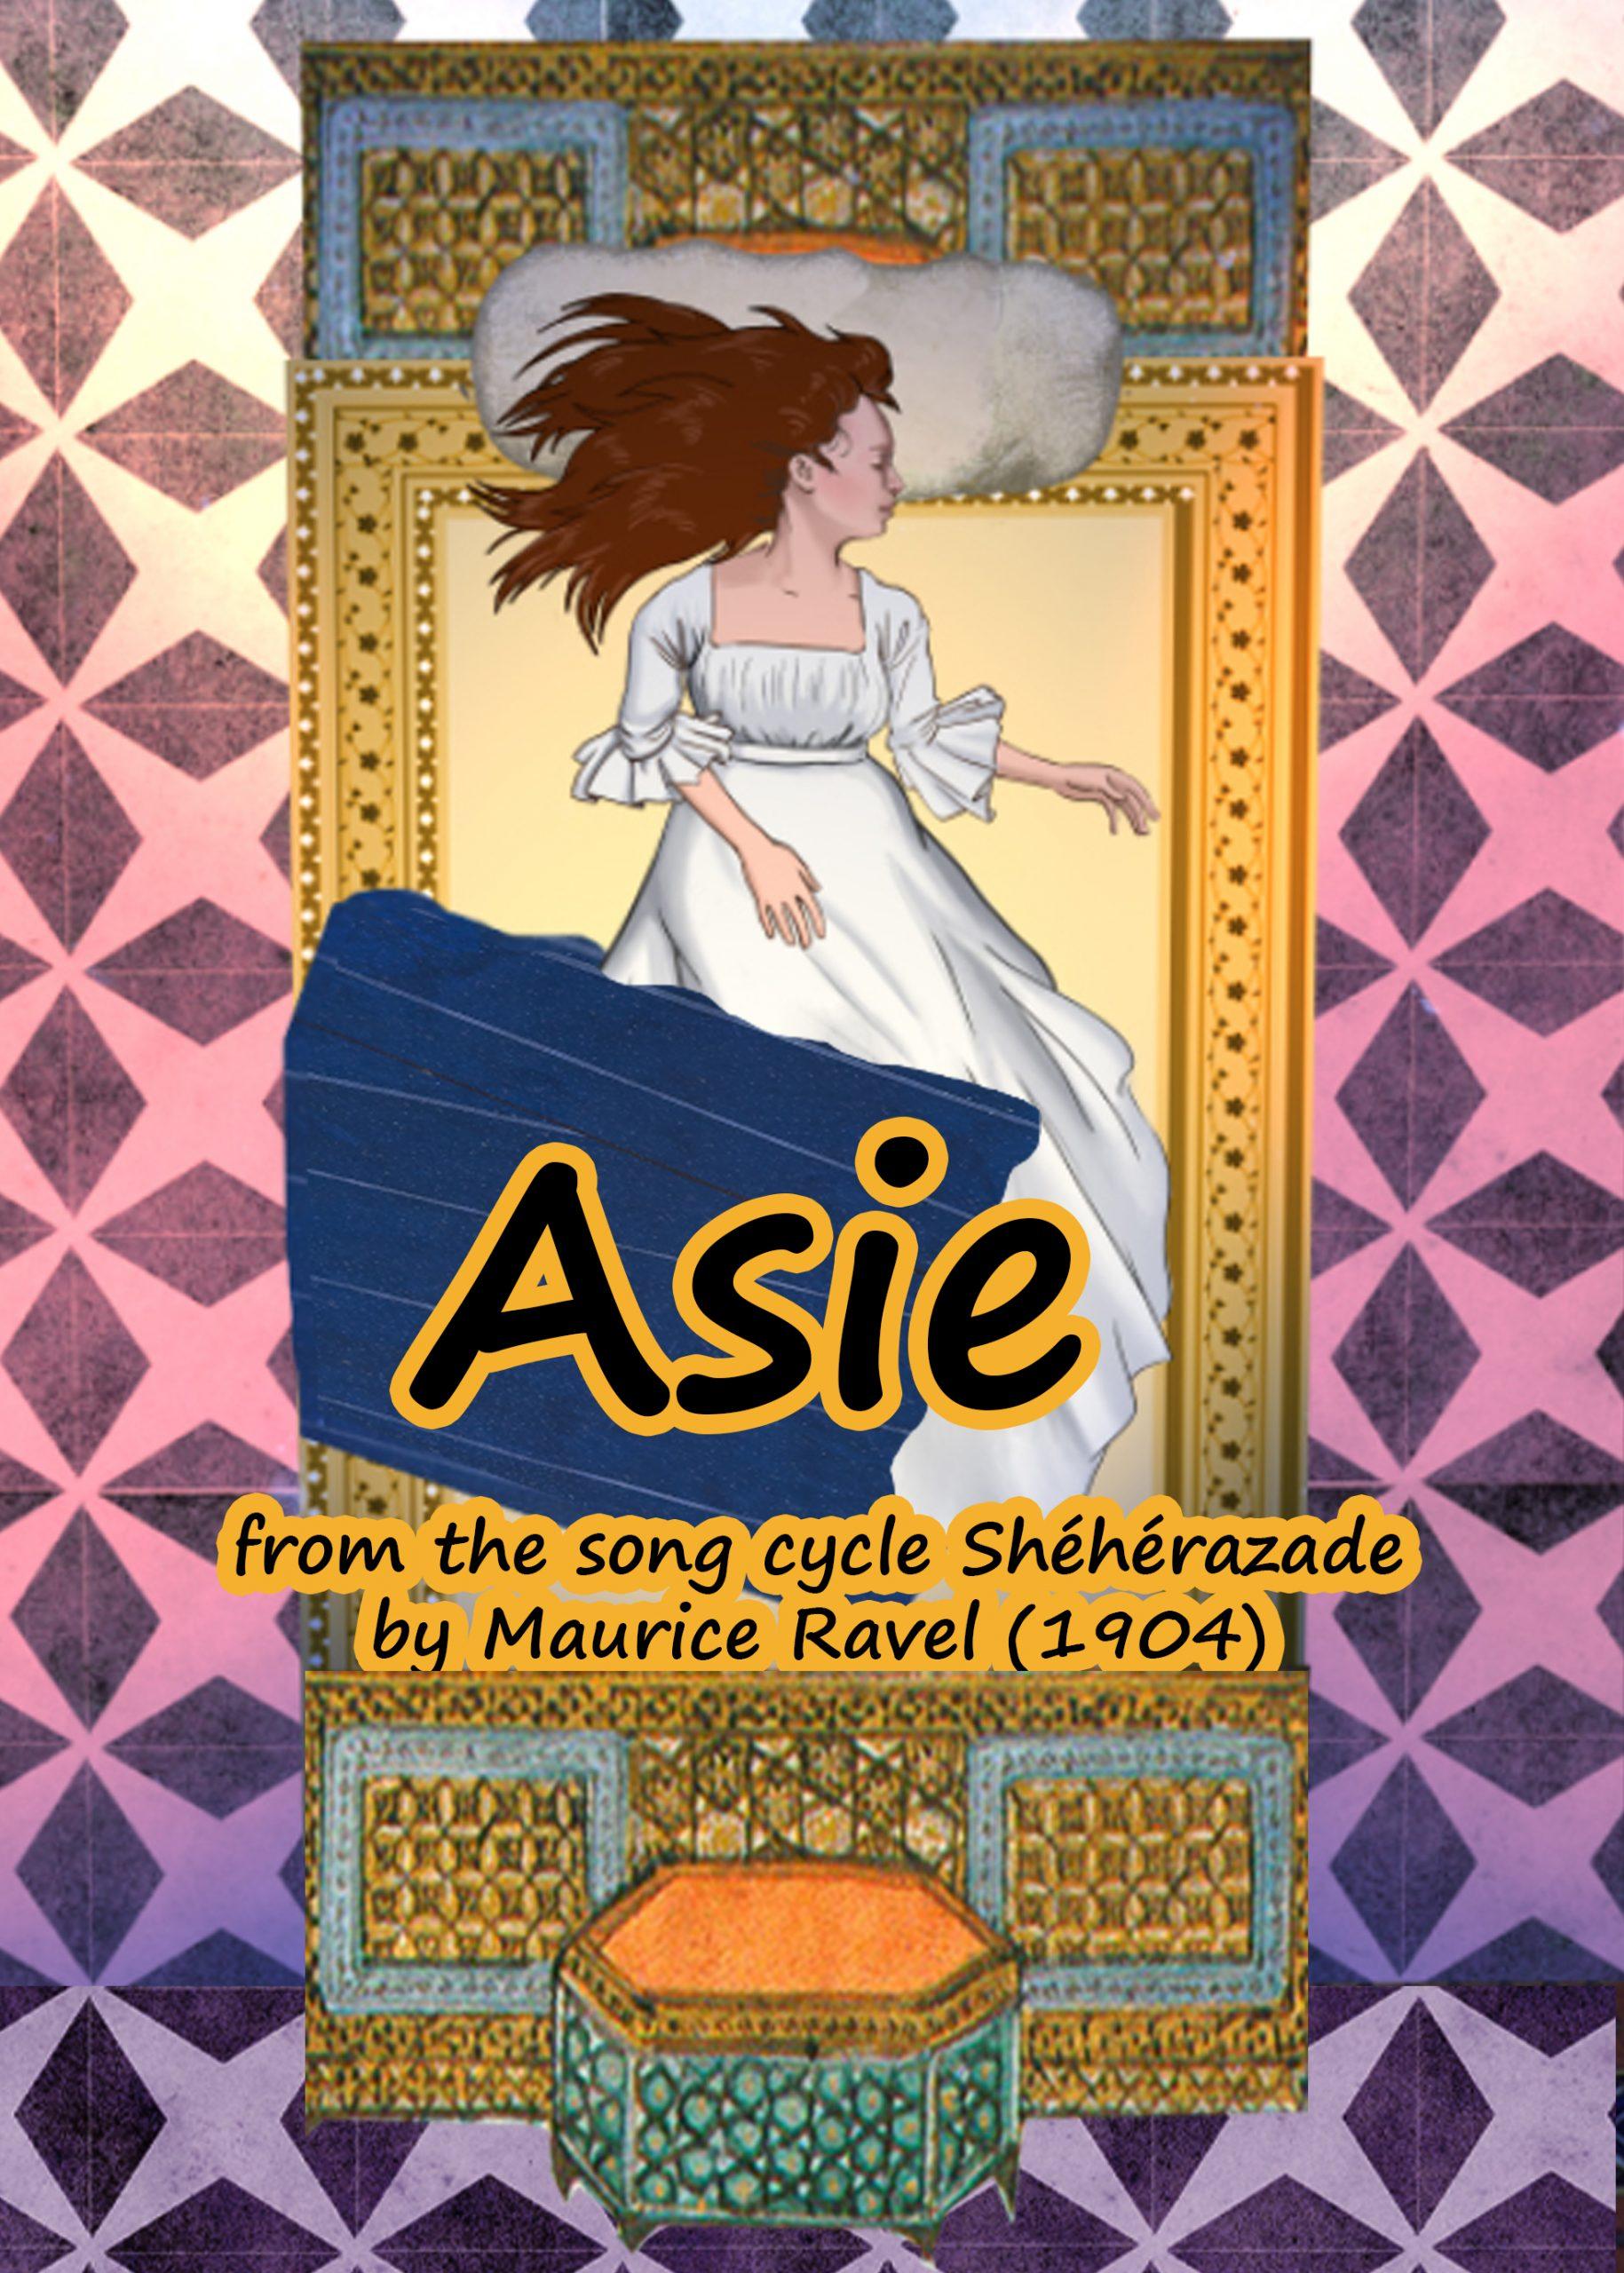 """Asie""by Maurice Ravel (Shéhérazade) Music Video"